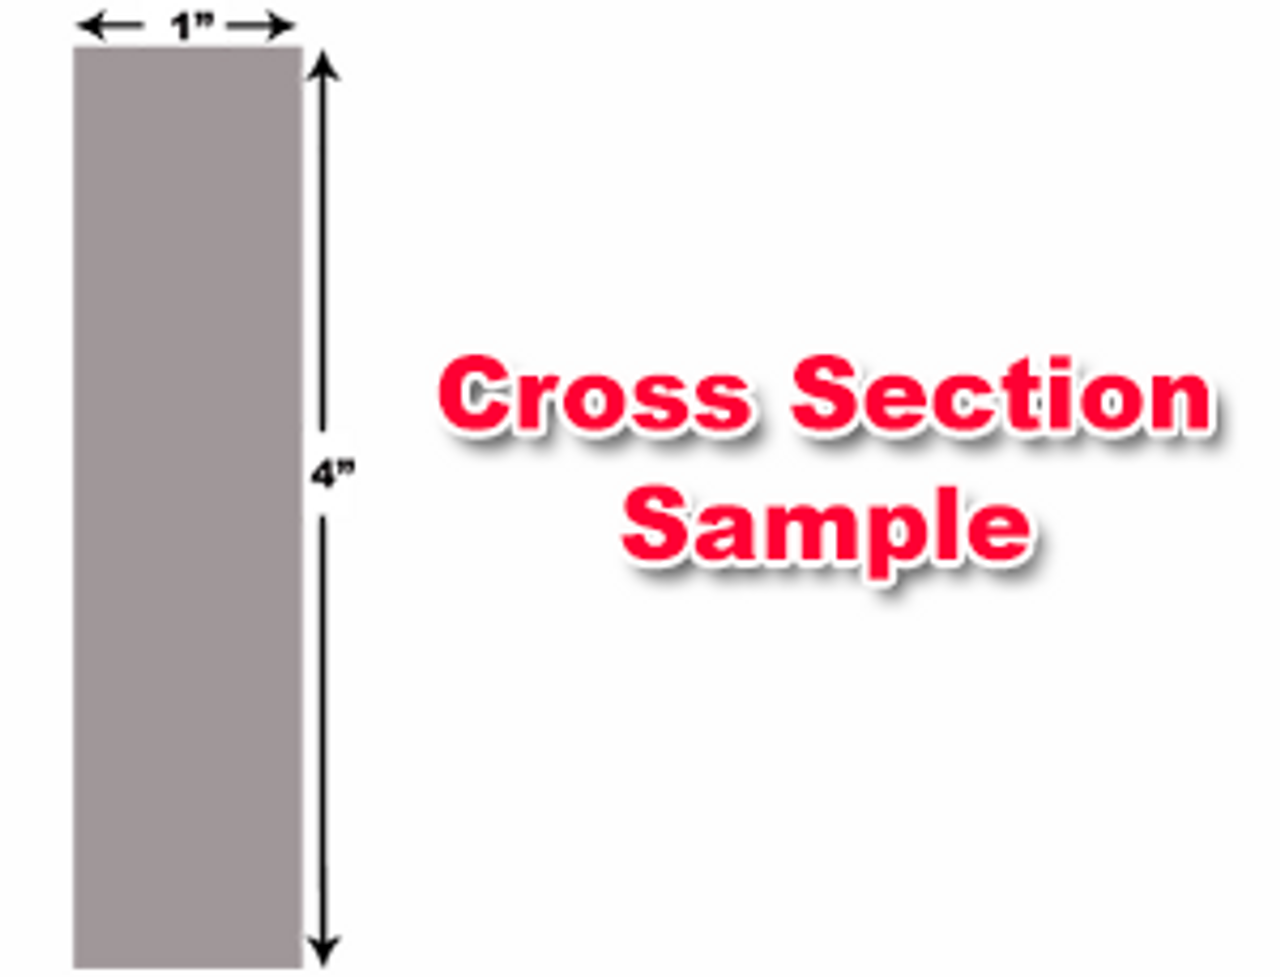 "Accurshear Shear Knives - 148"" Length, 4"" x 1"" Cross Section (239128) Type B"